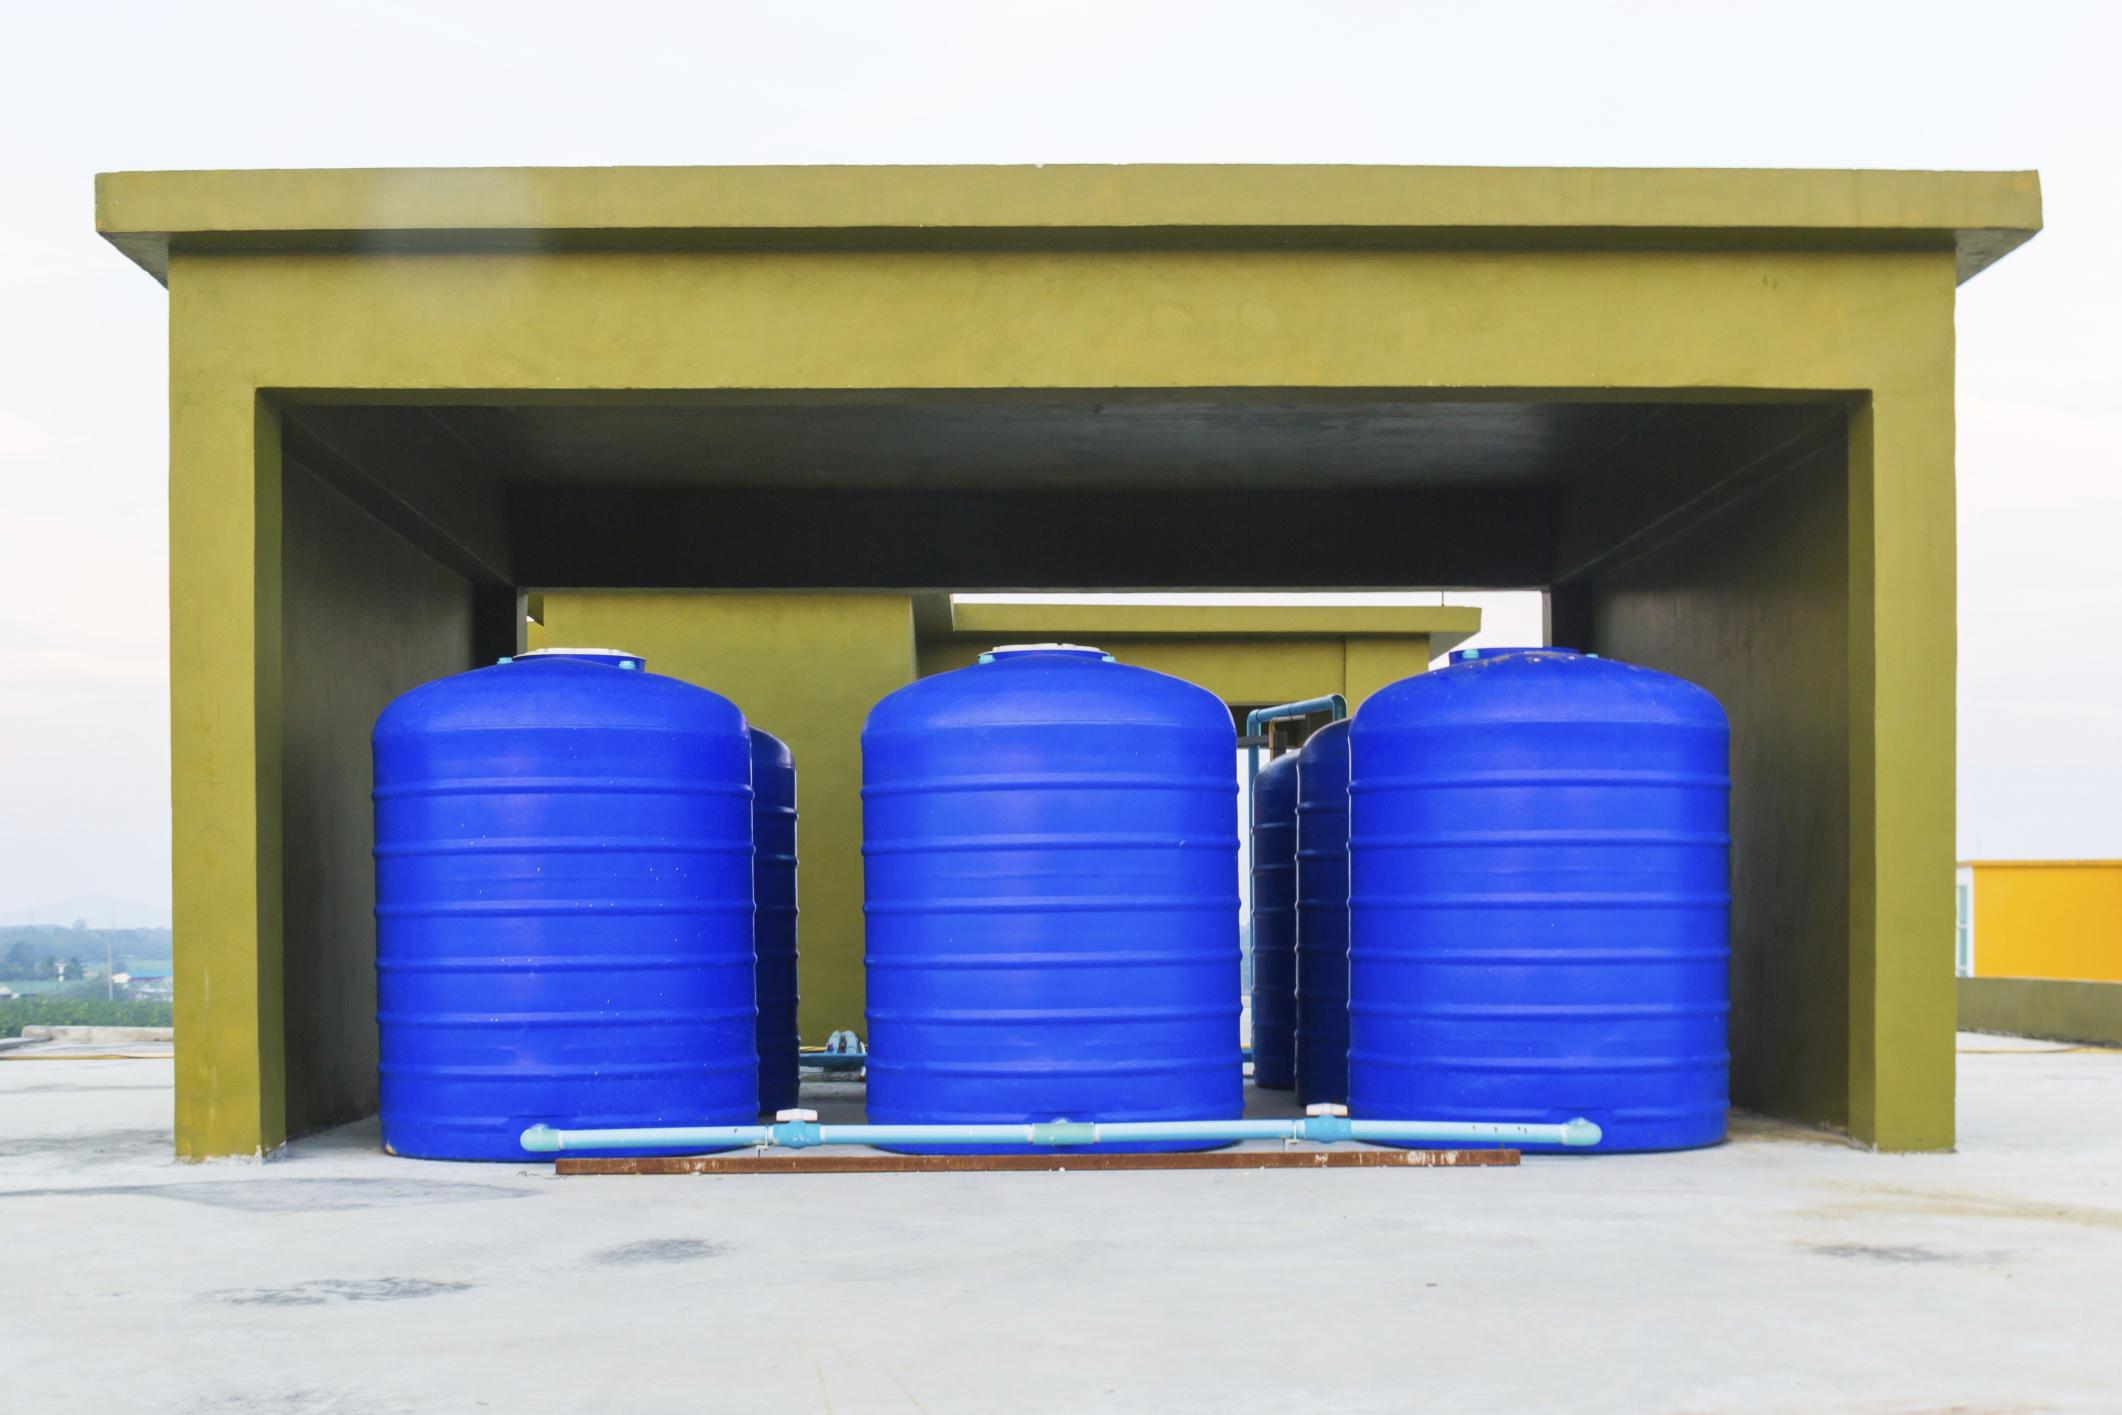 Rainwater harvesting storage tanks